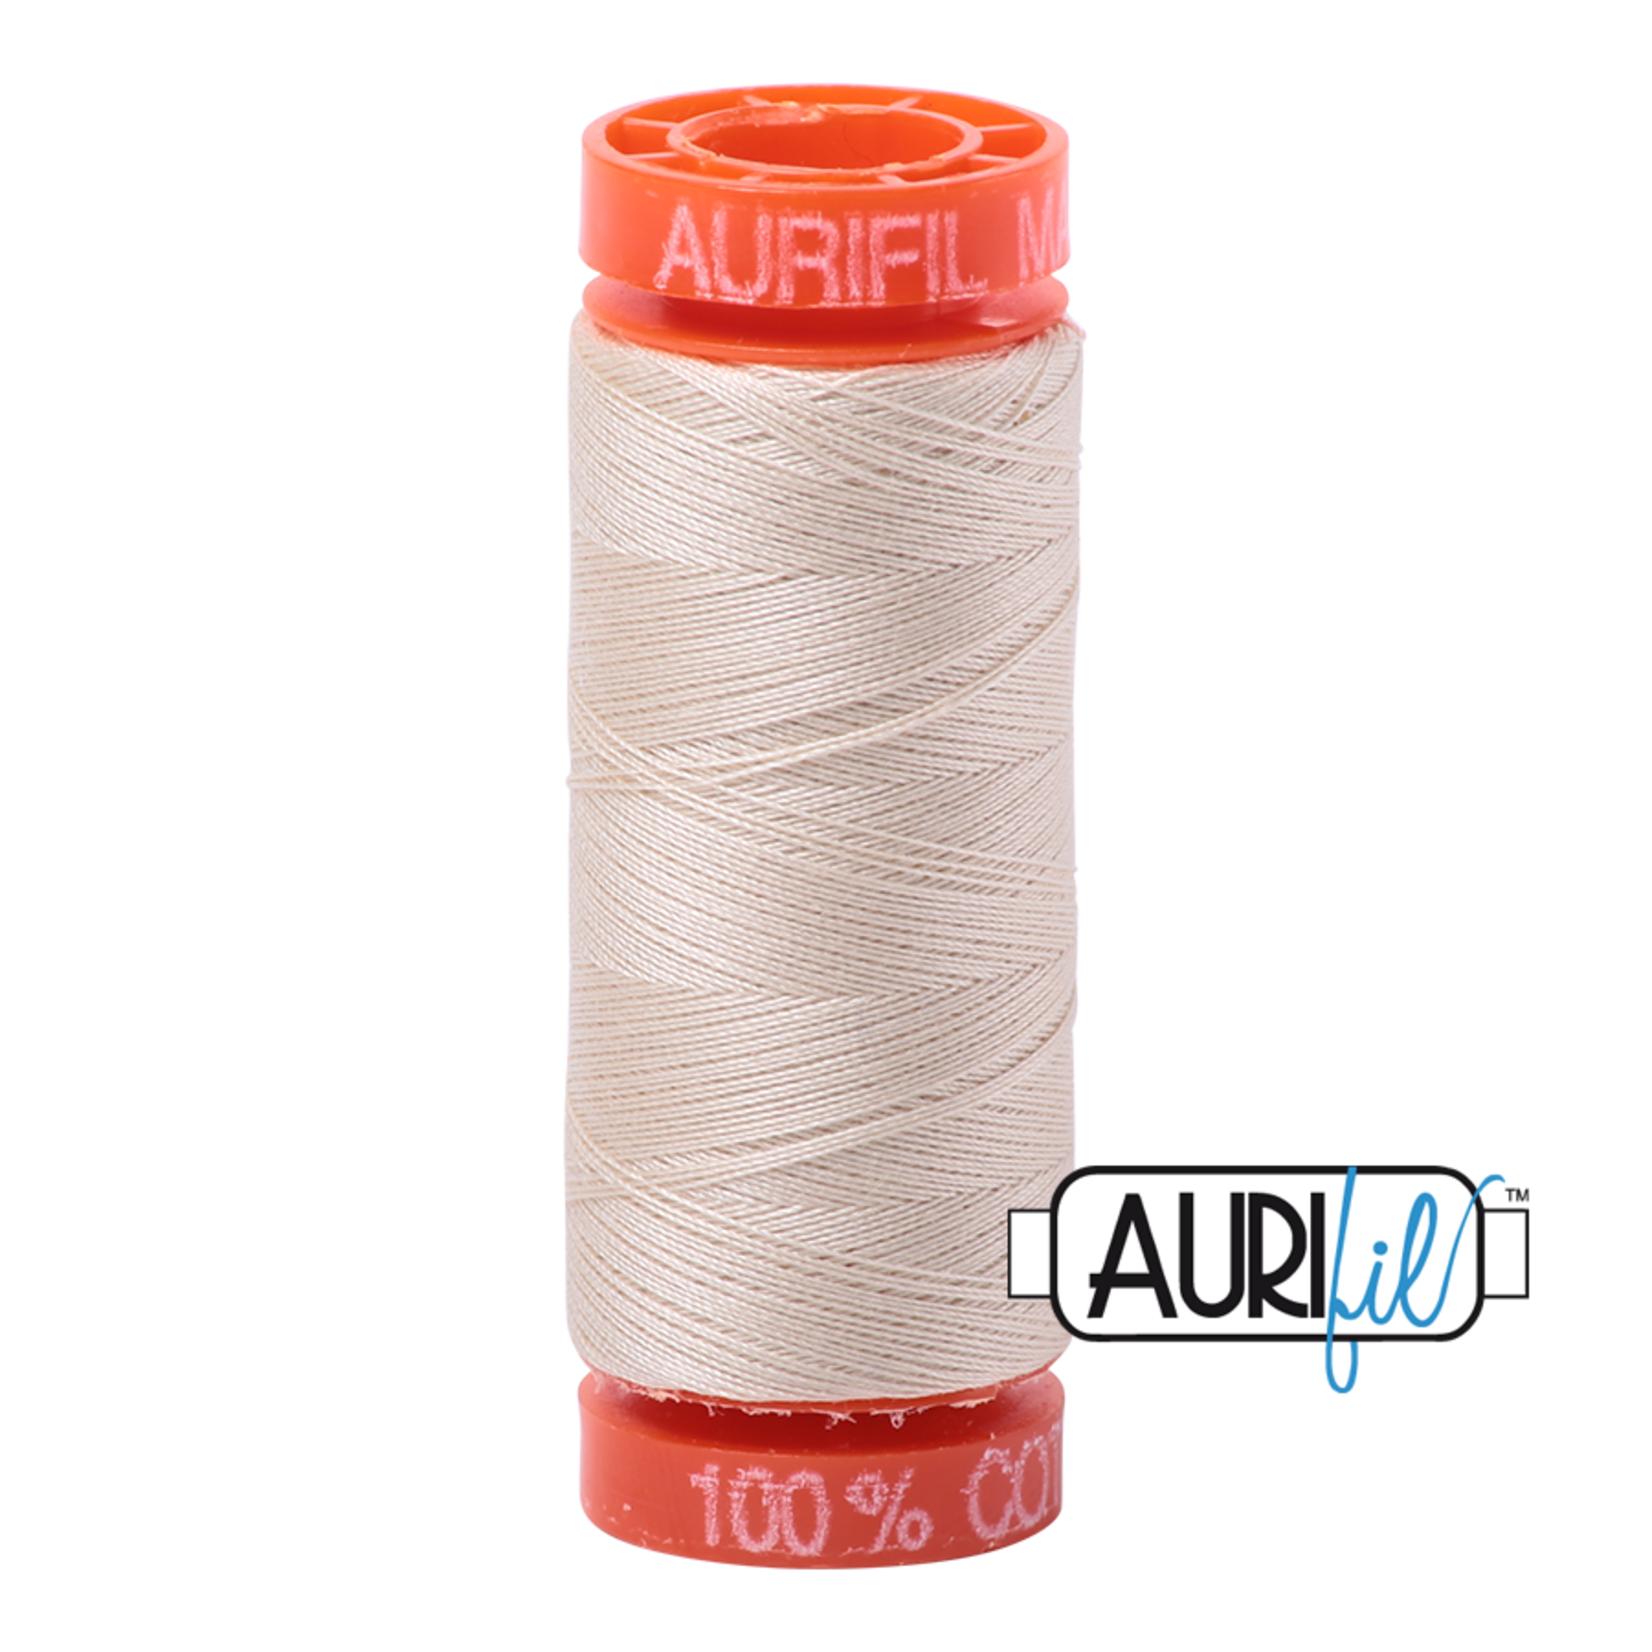 AURIFIL AURIFIL 50 WT 2310 Small Spool